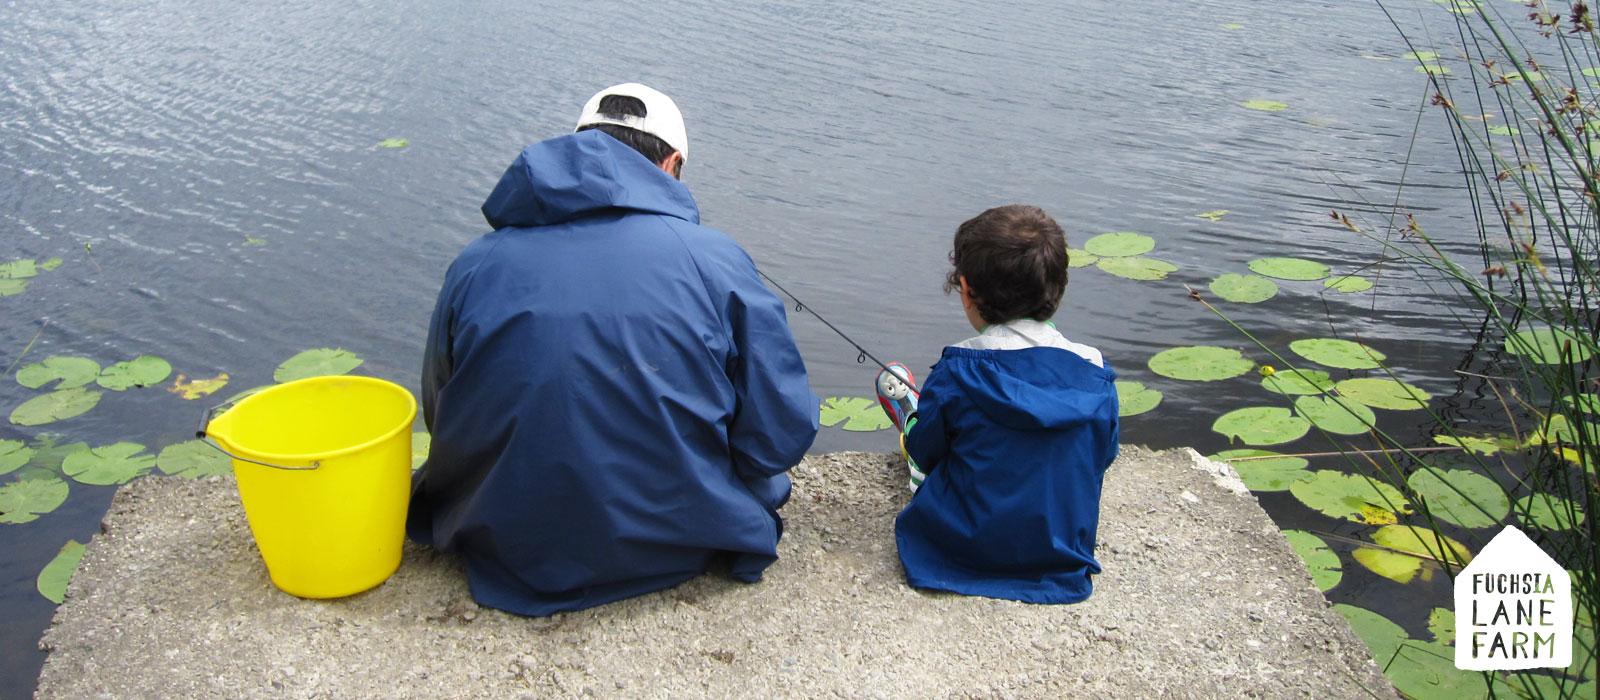 Fishing on Lough Derg